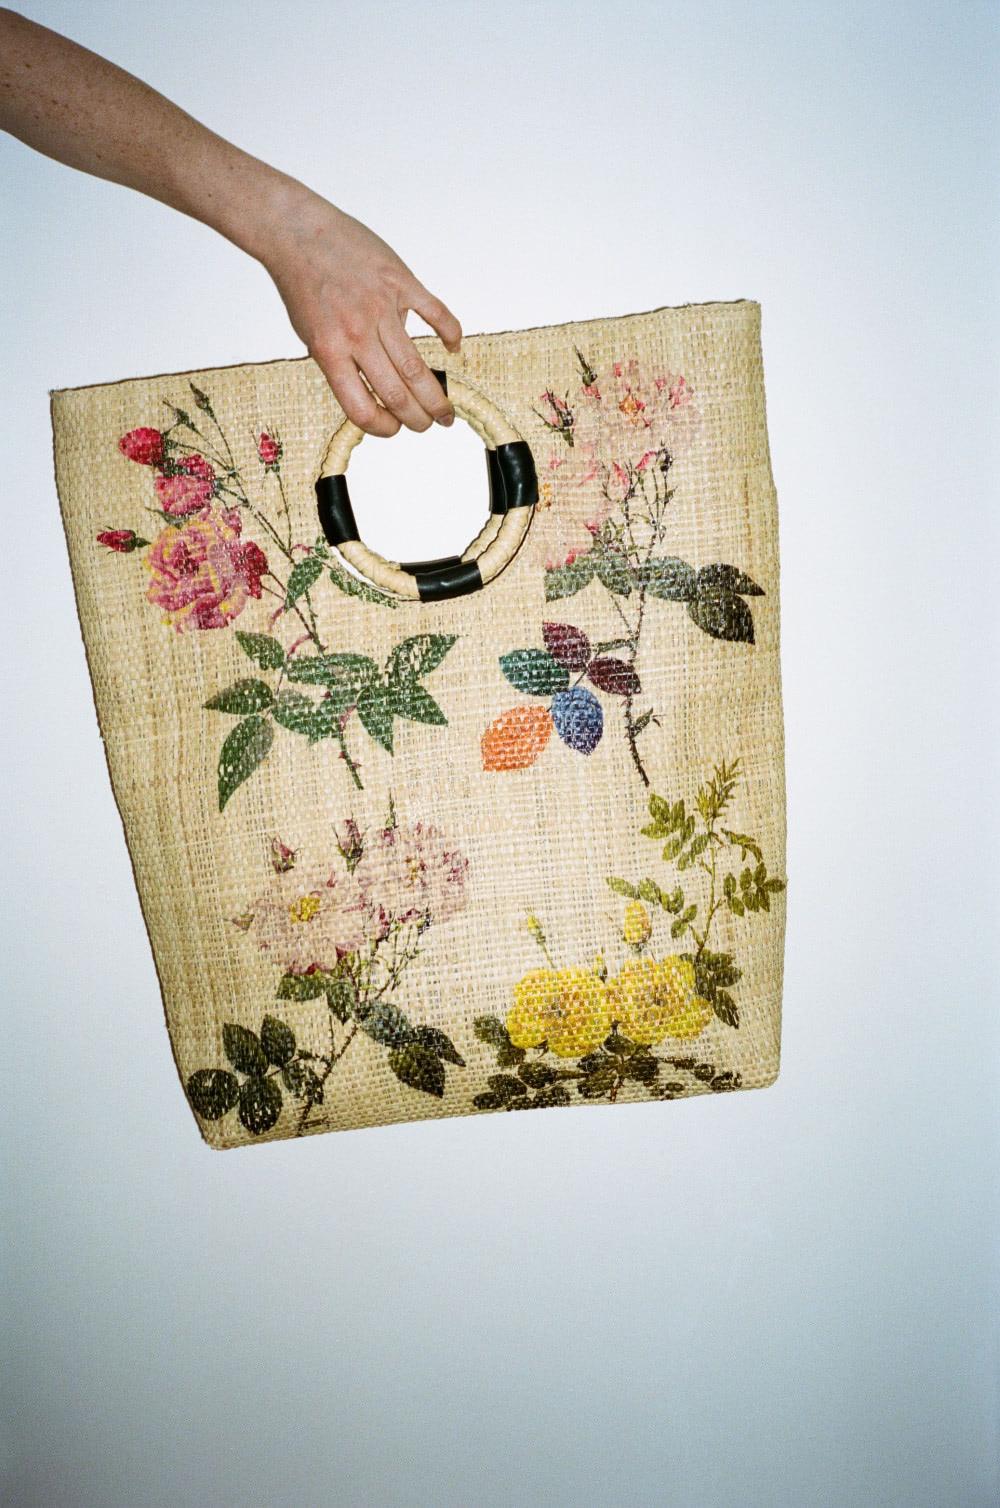 Ceci est un sac